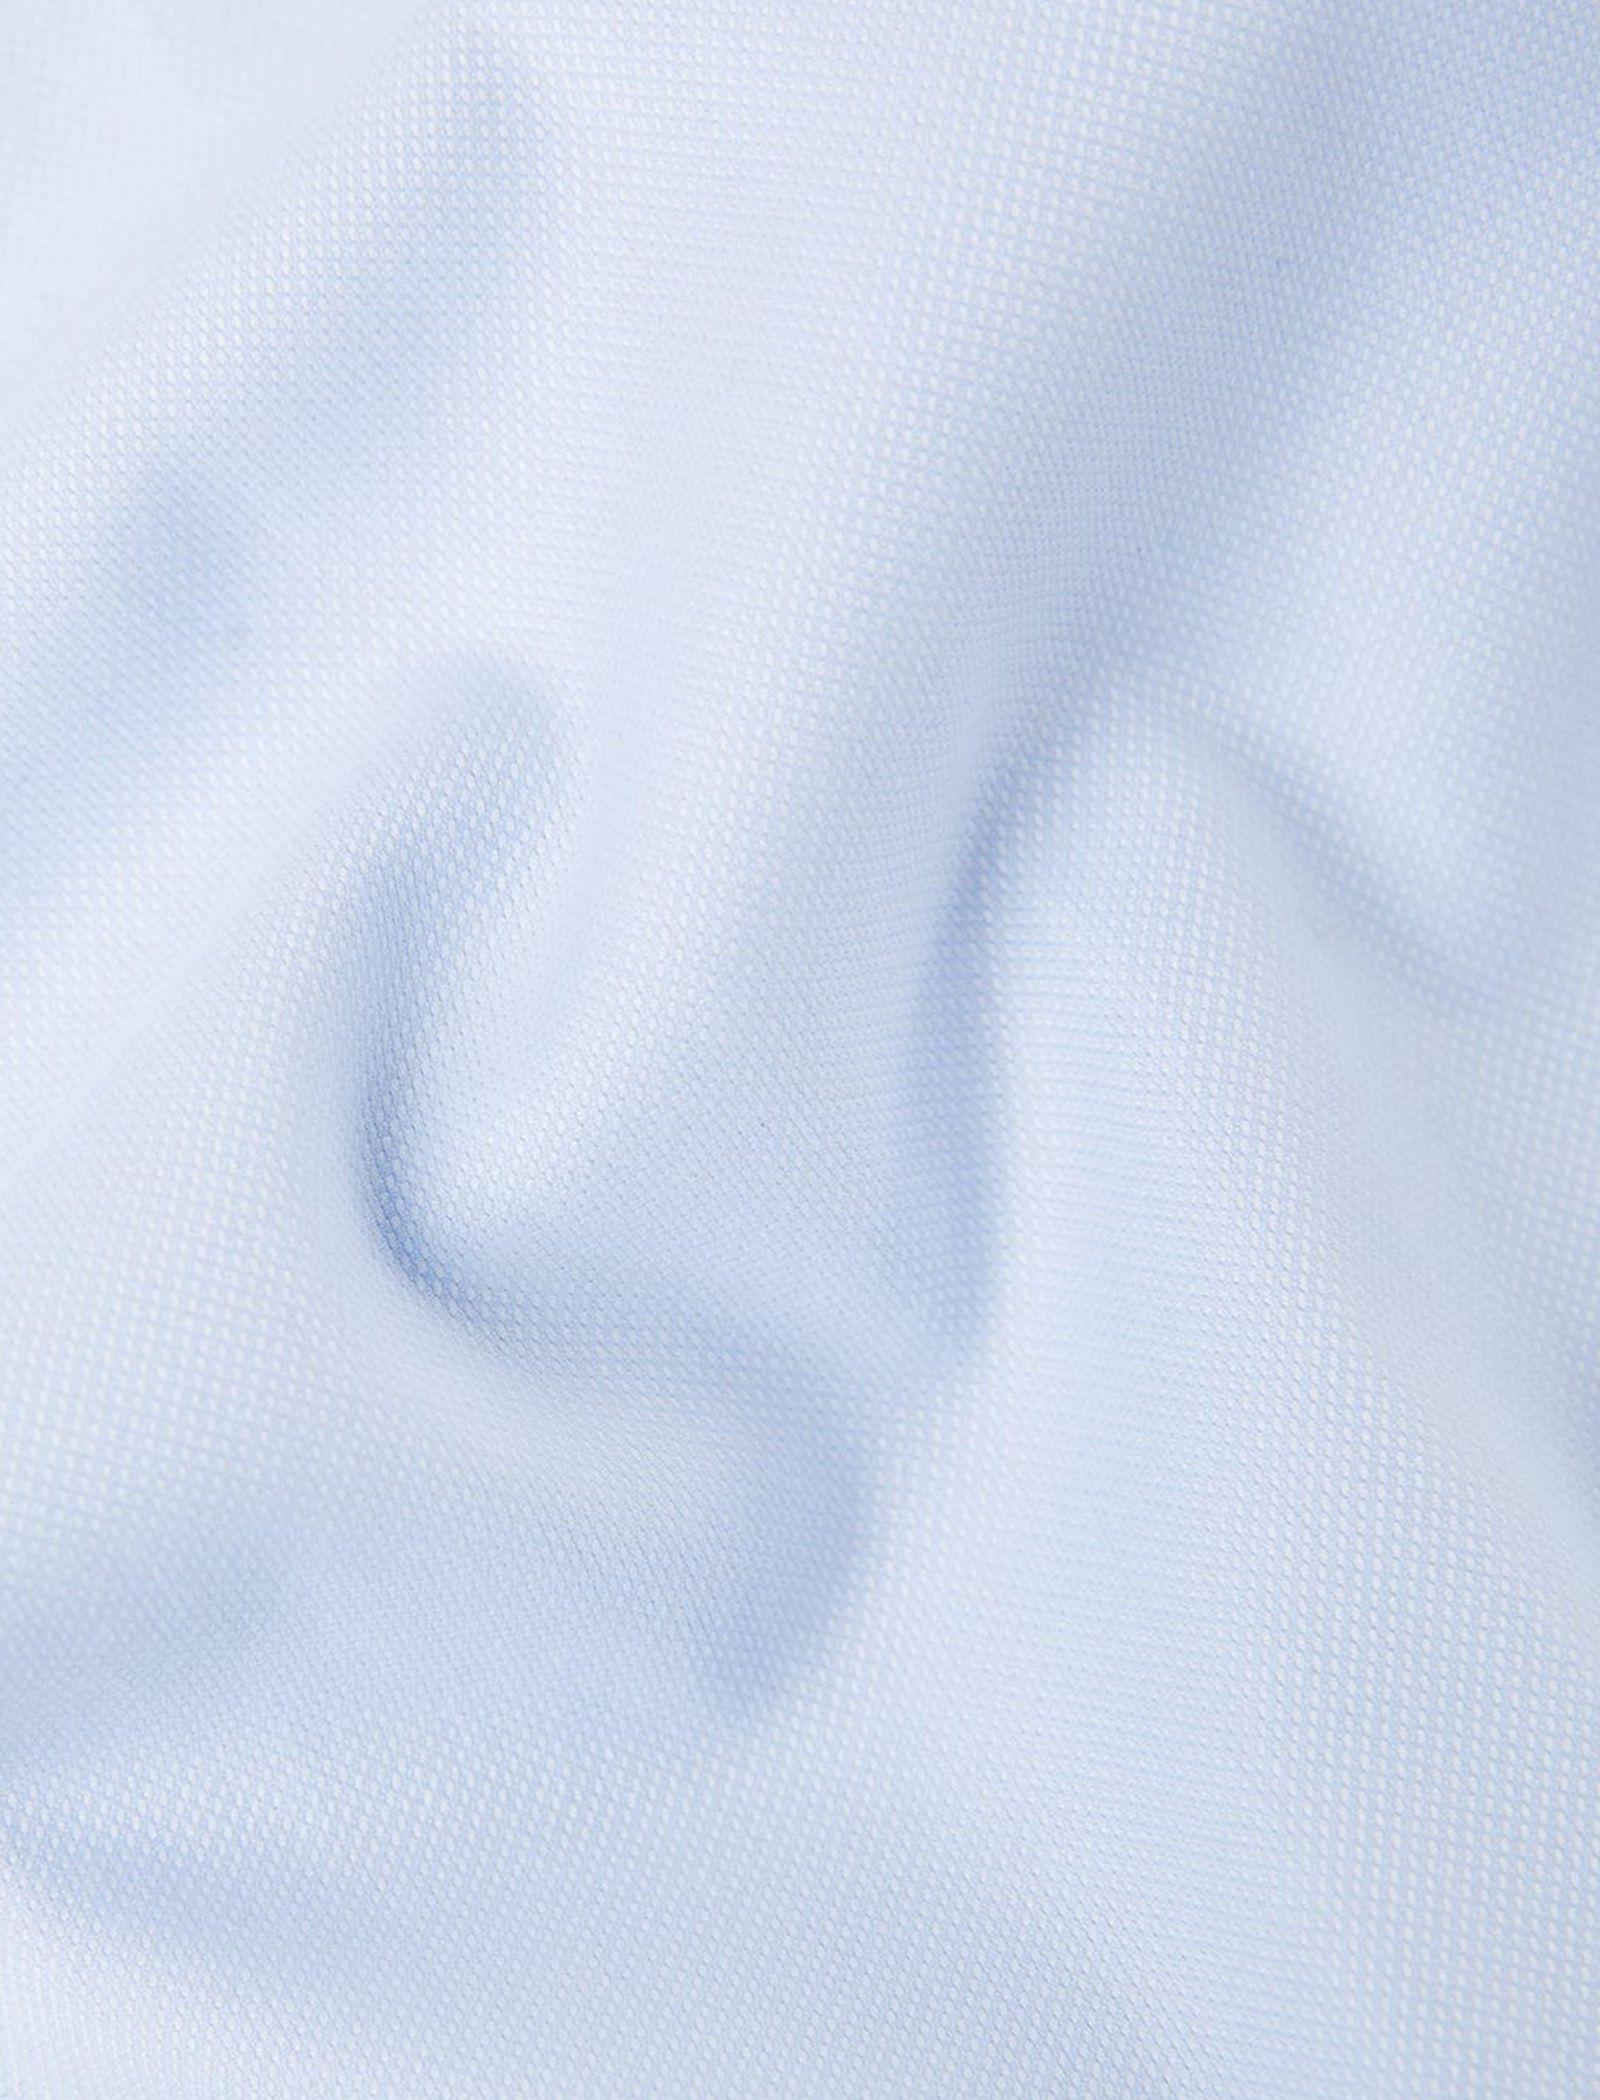 پیراهن نخی آستین بلند مردانه - مانگو - آبي روشن - 4